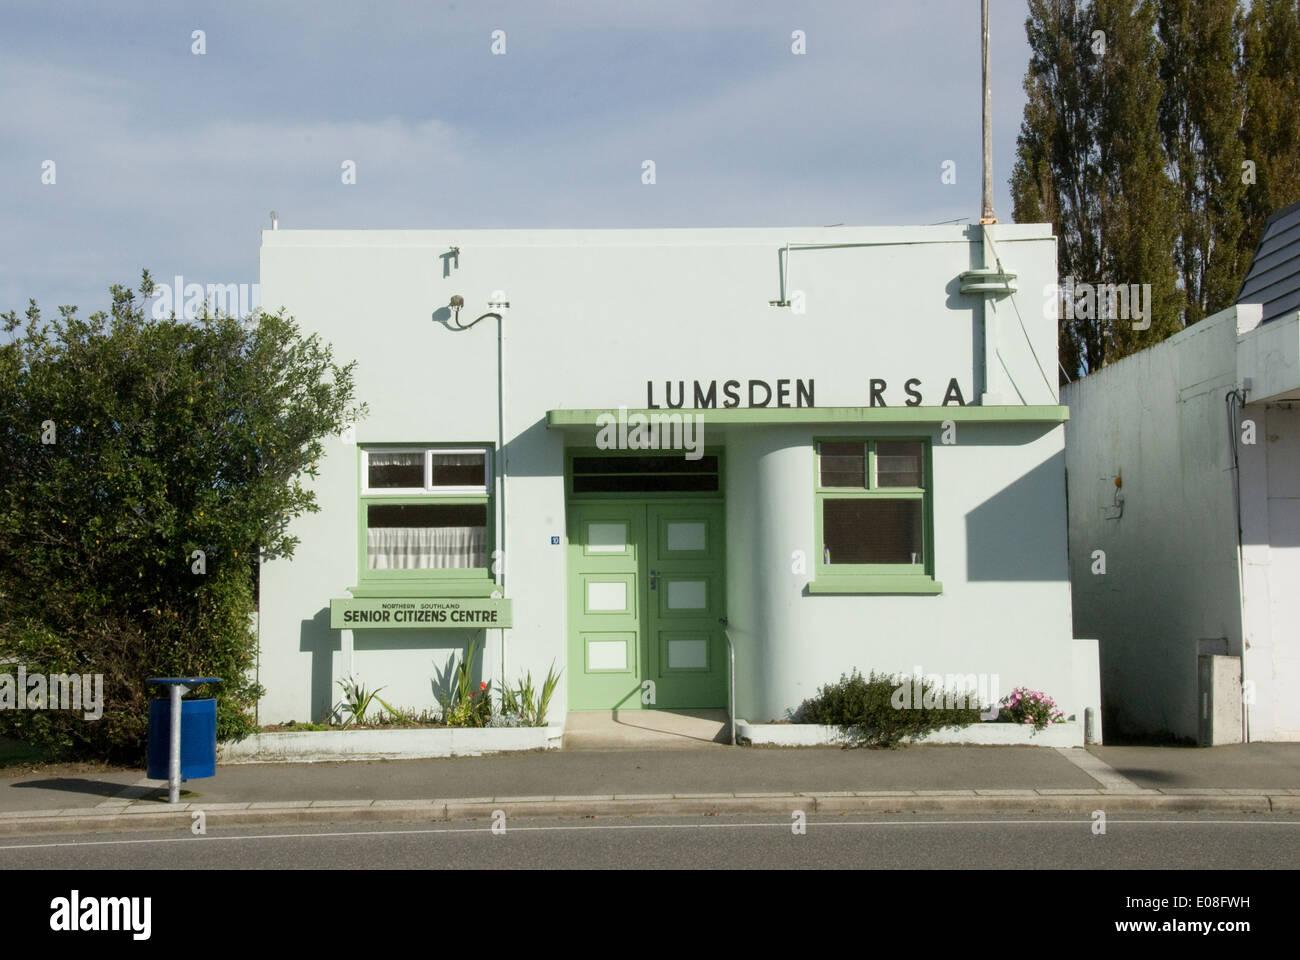 Returned Servicemans Association building, Lumsdon, Southland, New Zealand - Stock Image